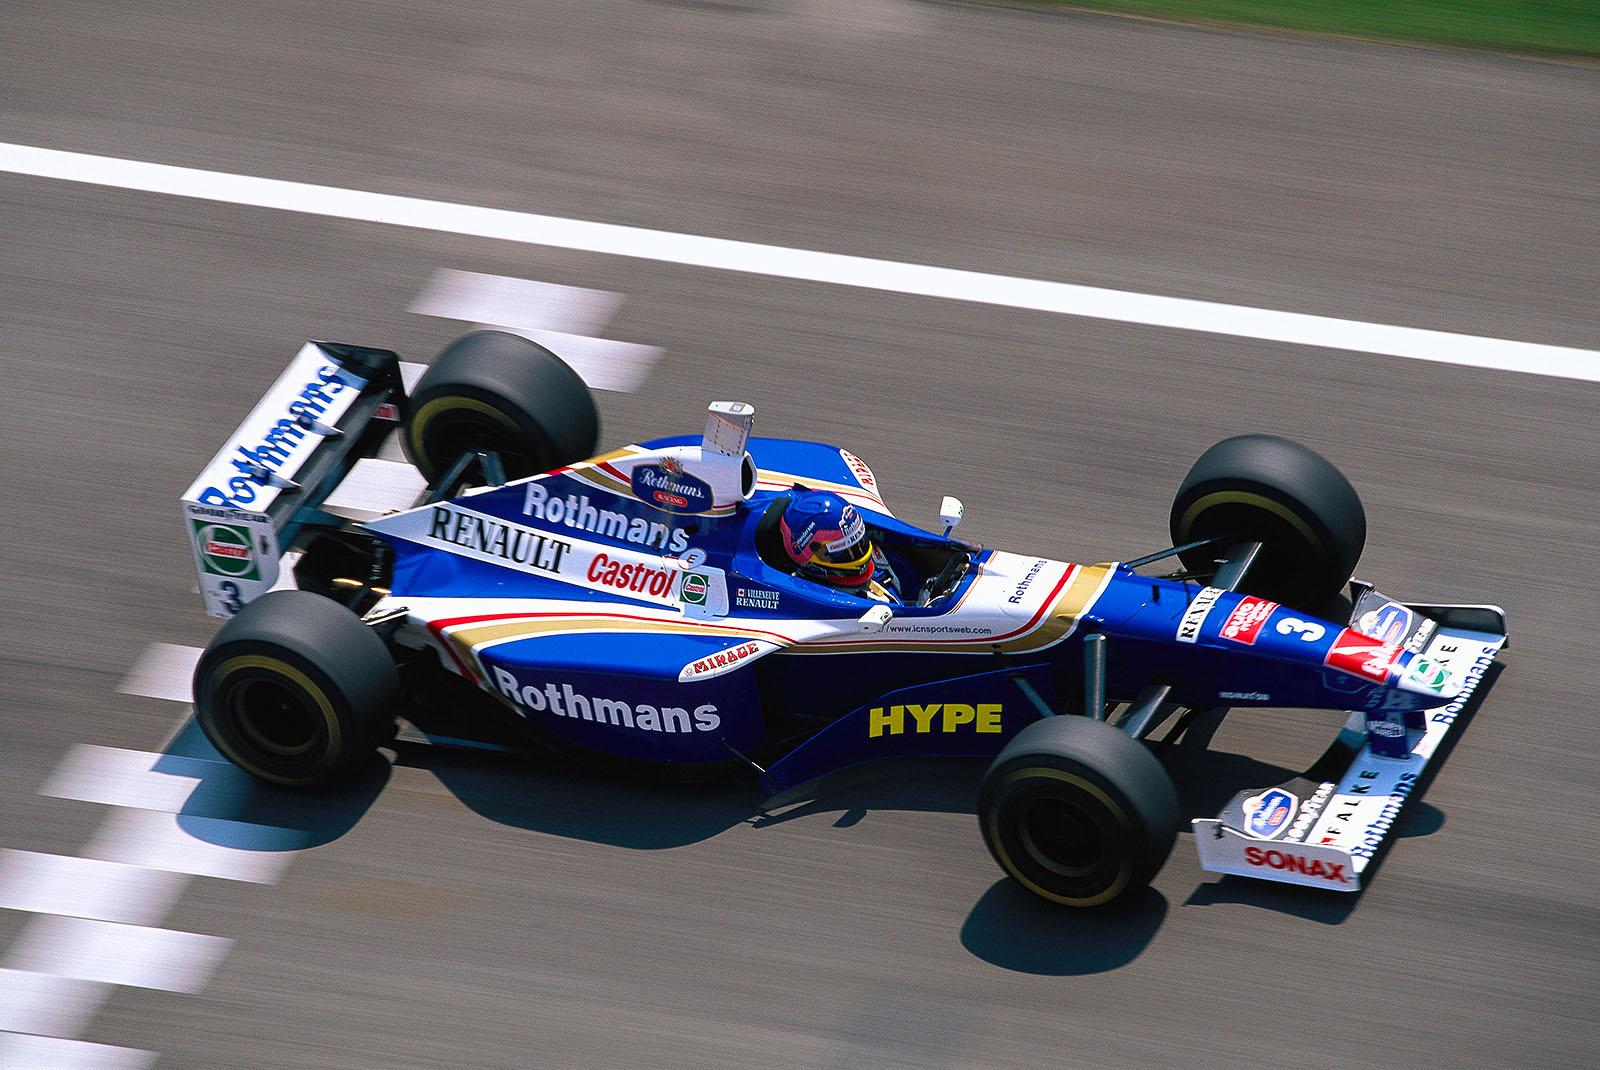 1997 - Rothmans Williams Renault